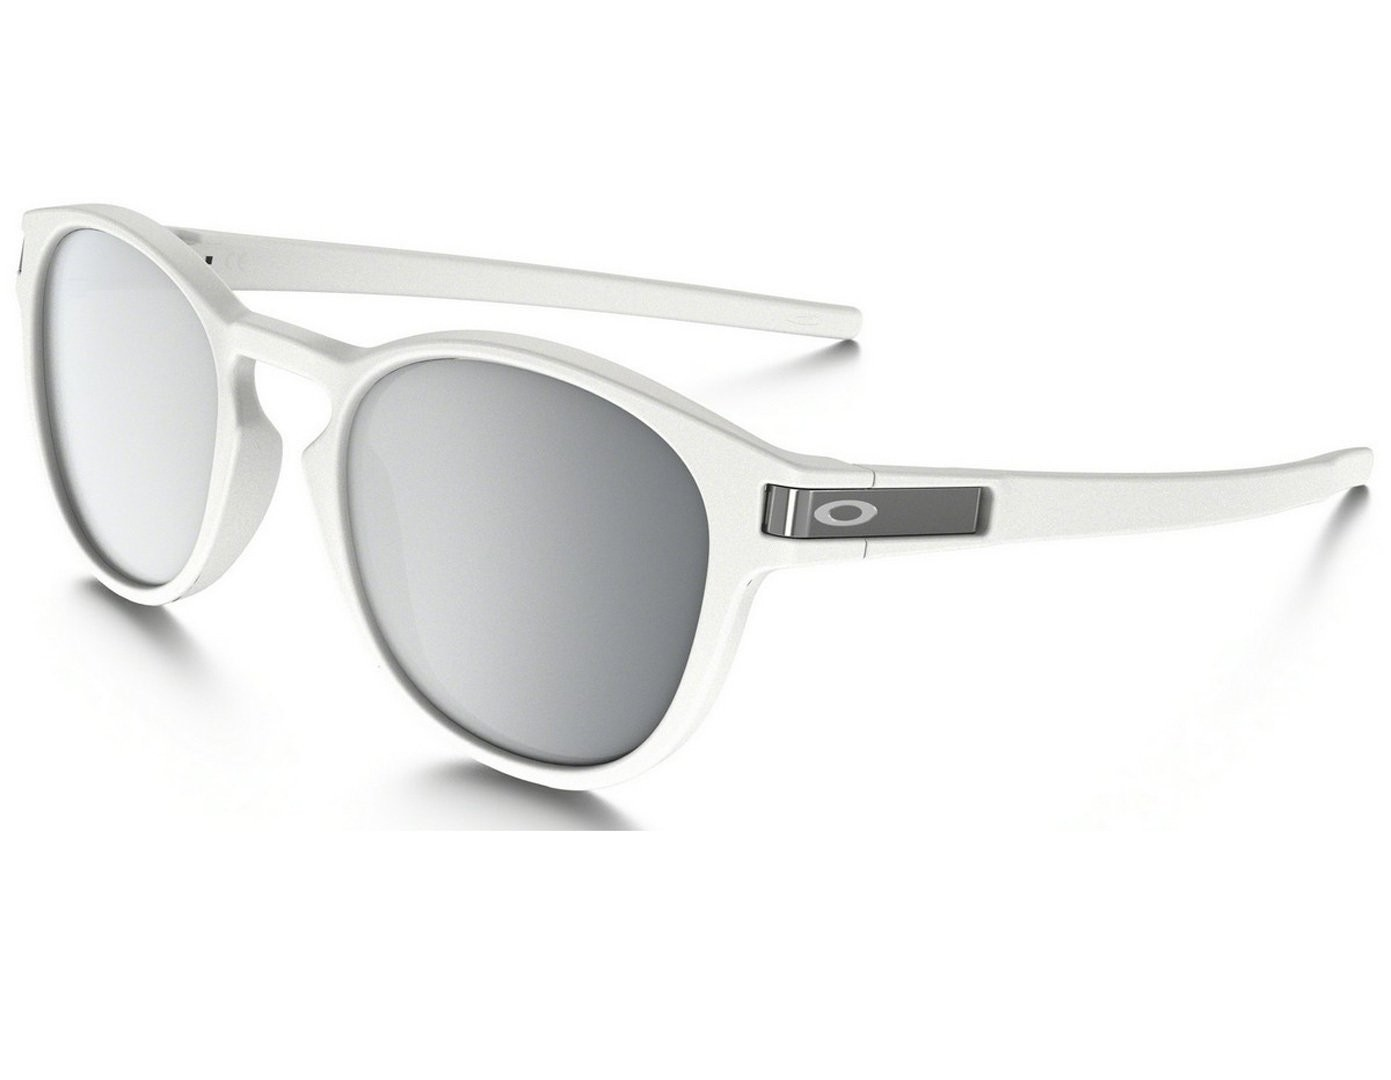 de0a2e3f55b Oakley Latch - Matte White   Chrome Iridium - OO9265-16 Zonnebril ...